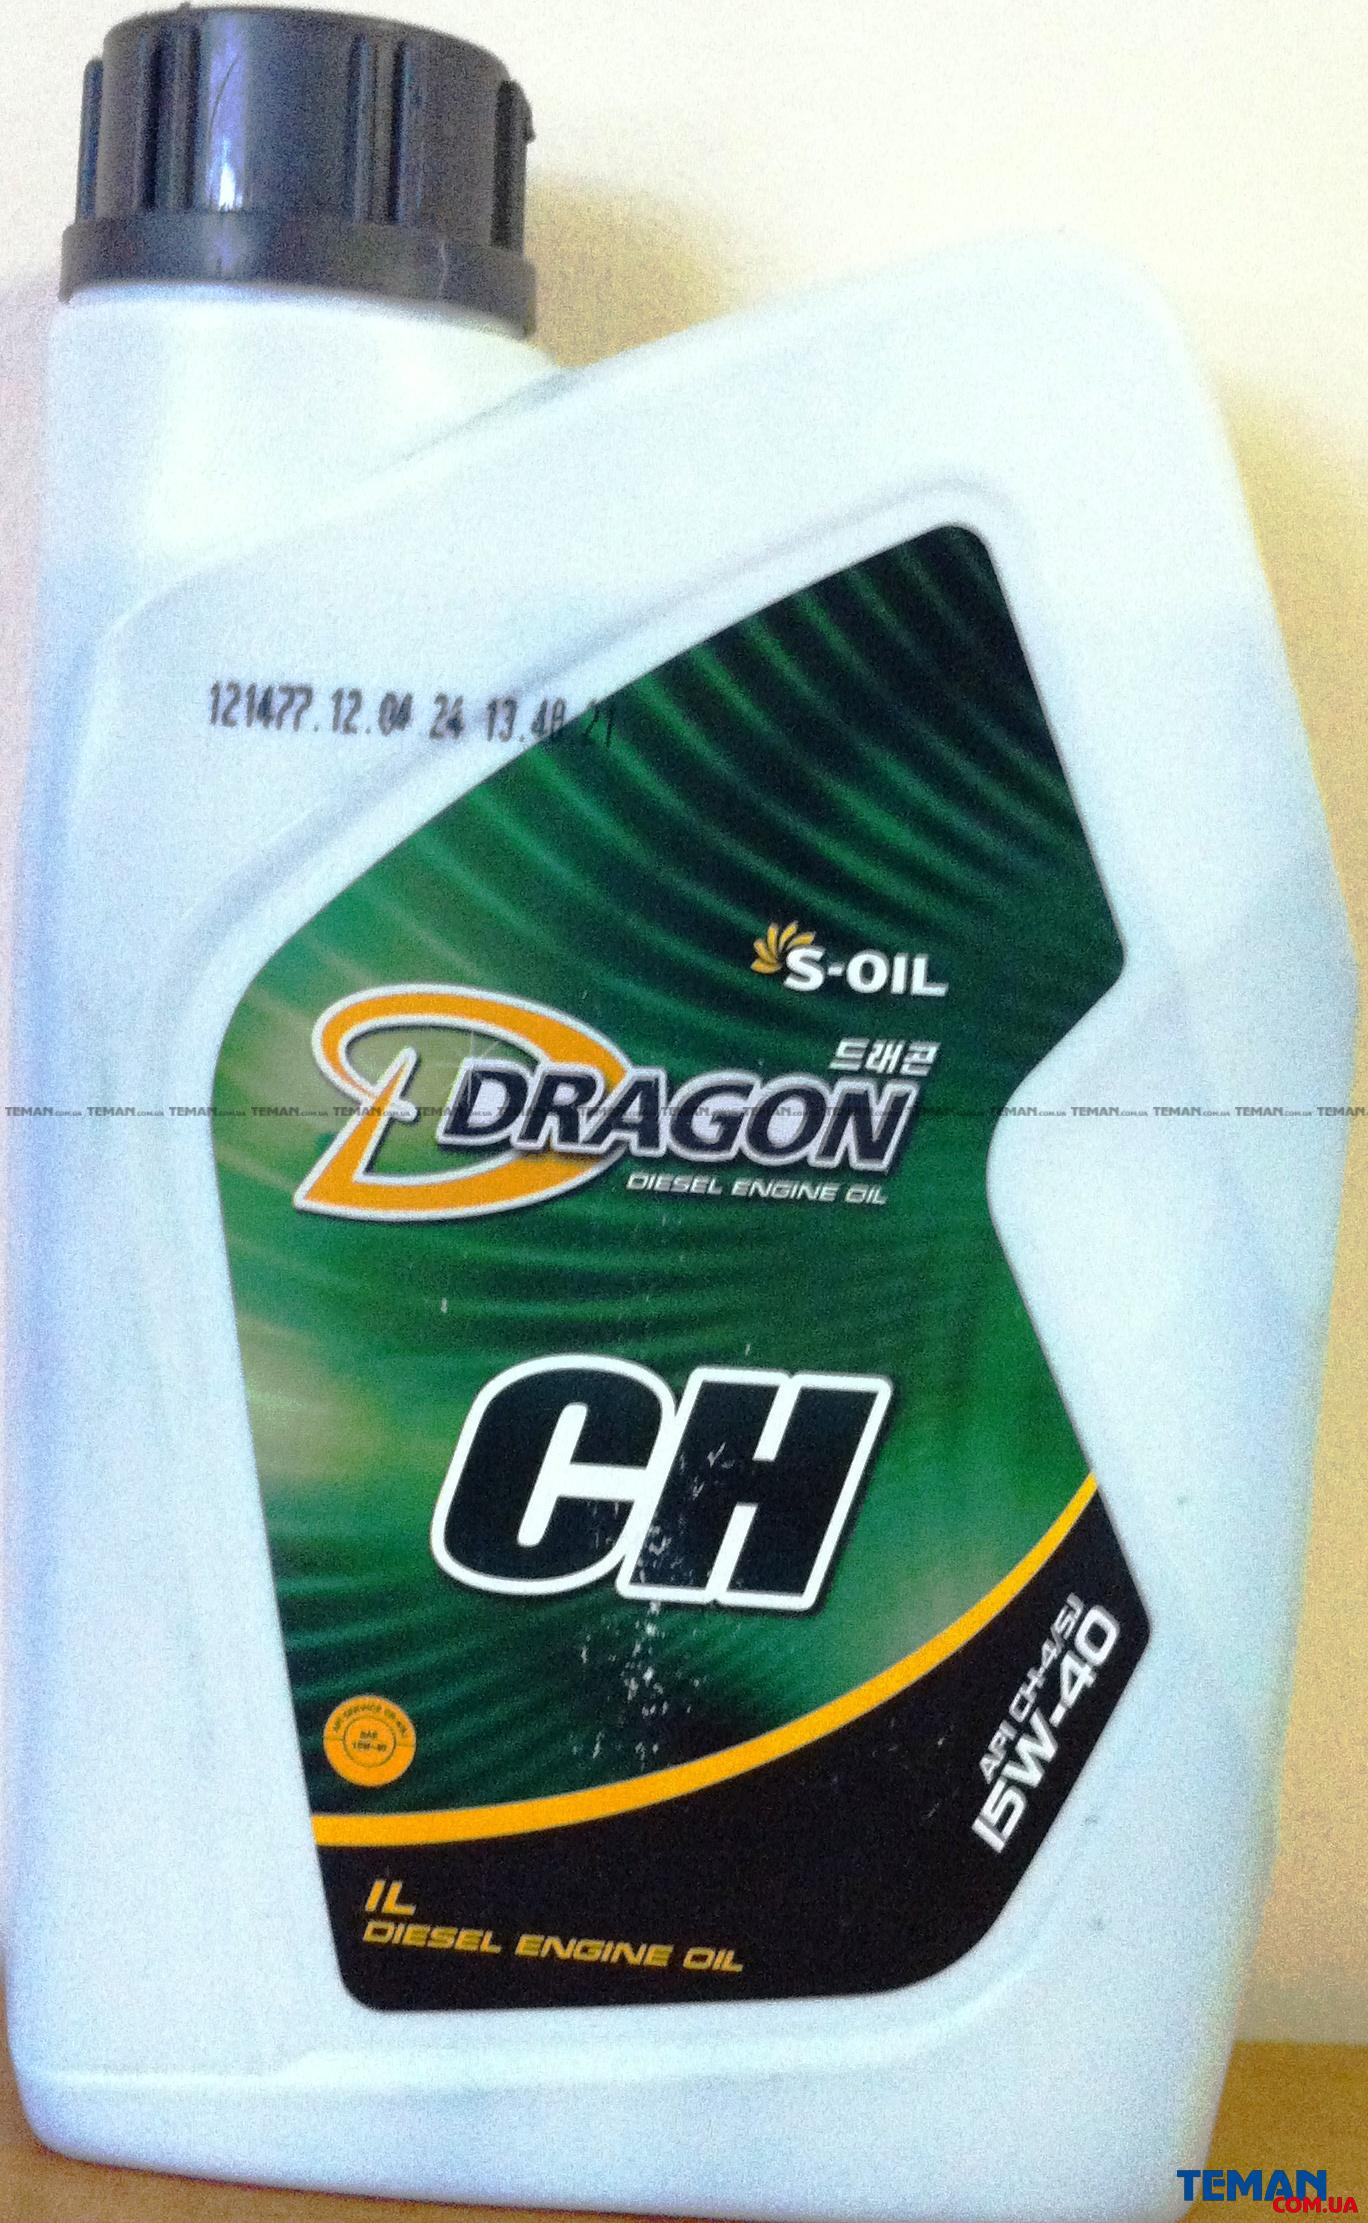 Полусинтетическое моторное масло DRAGON CH-4/SJ 15W40, 1 л